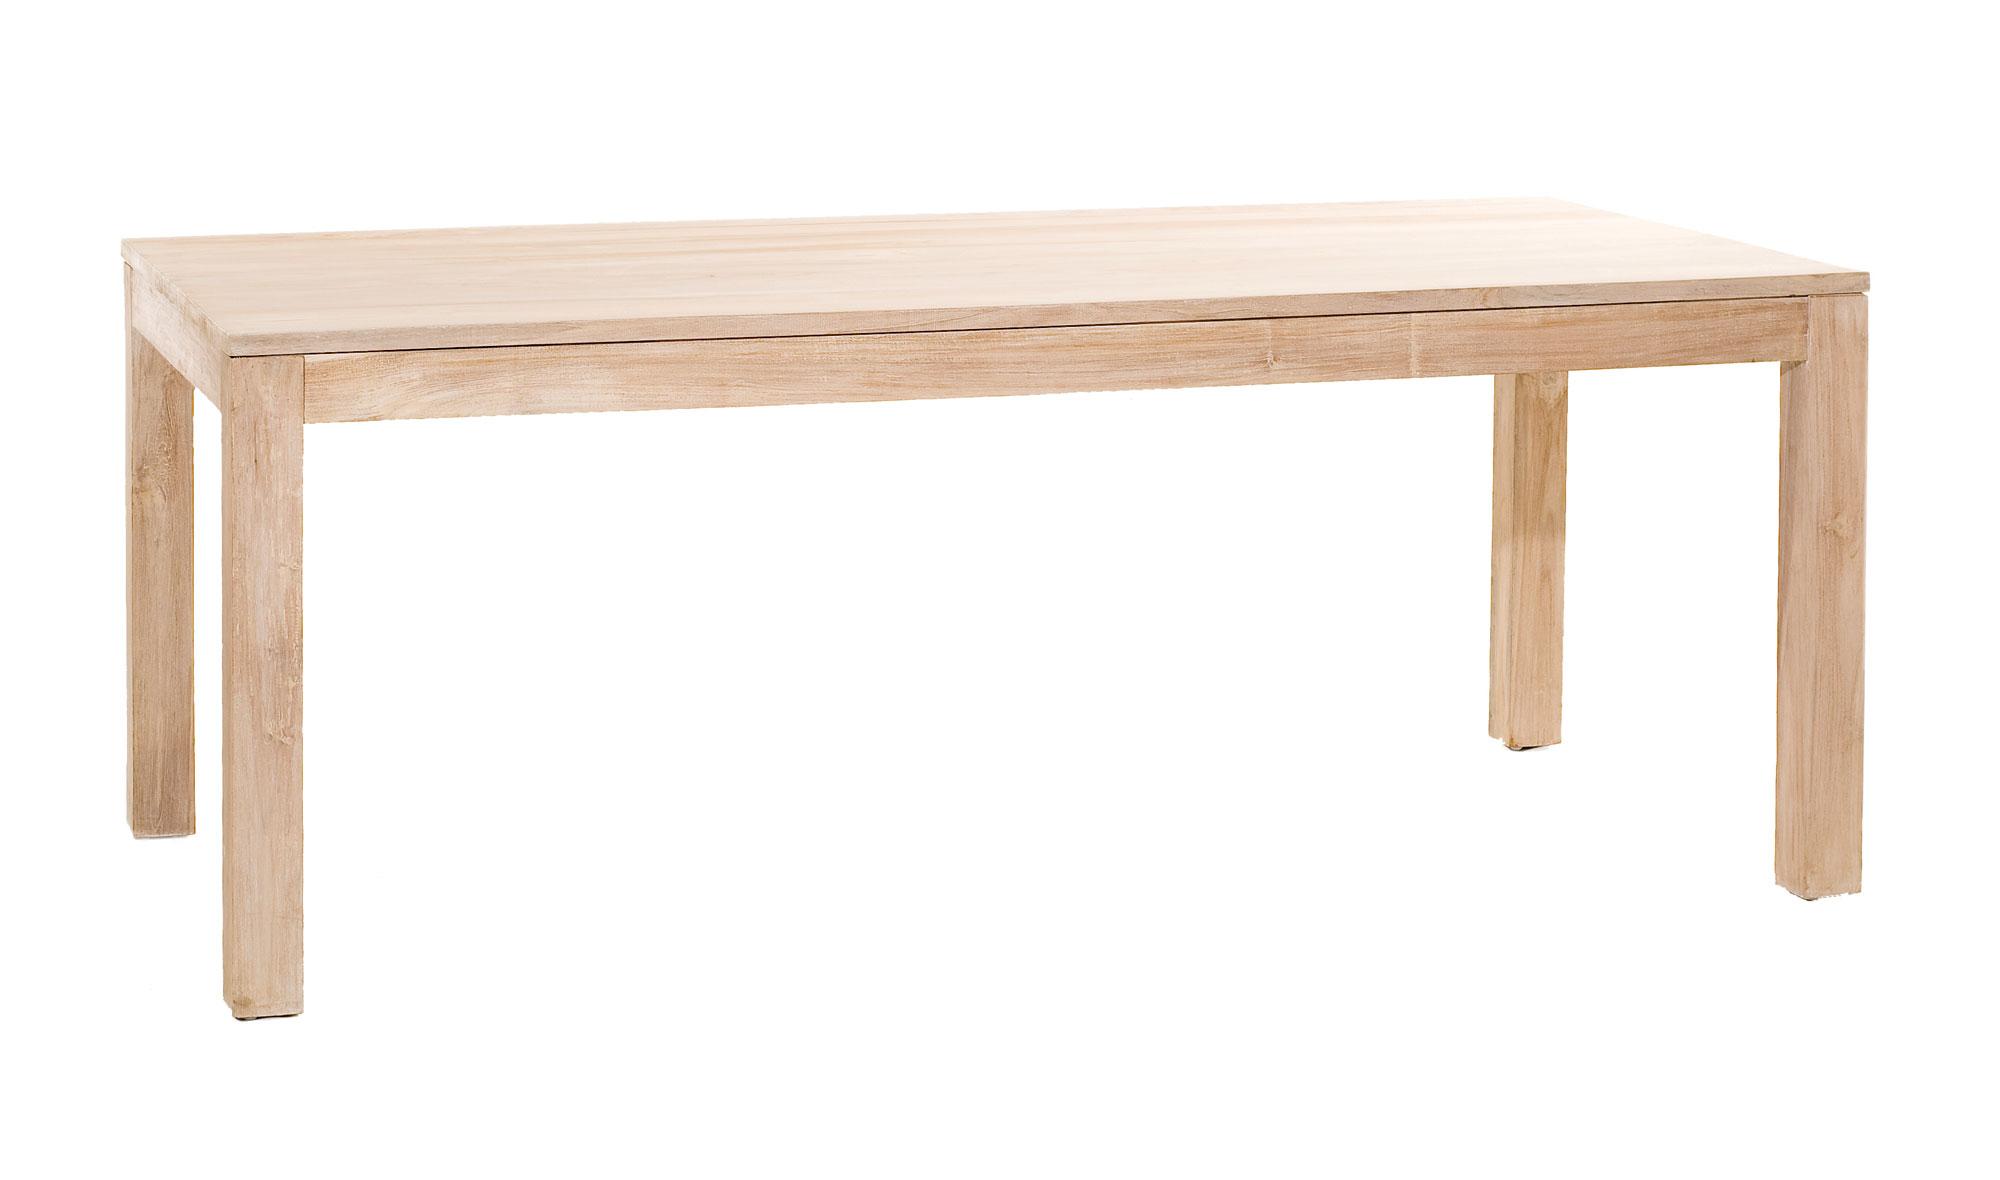 Mesa de comedor rectangular colonial madera lavada no for Mesa comedor rectangular madera